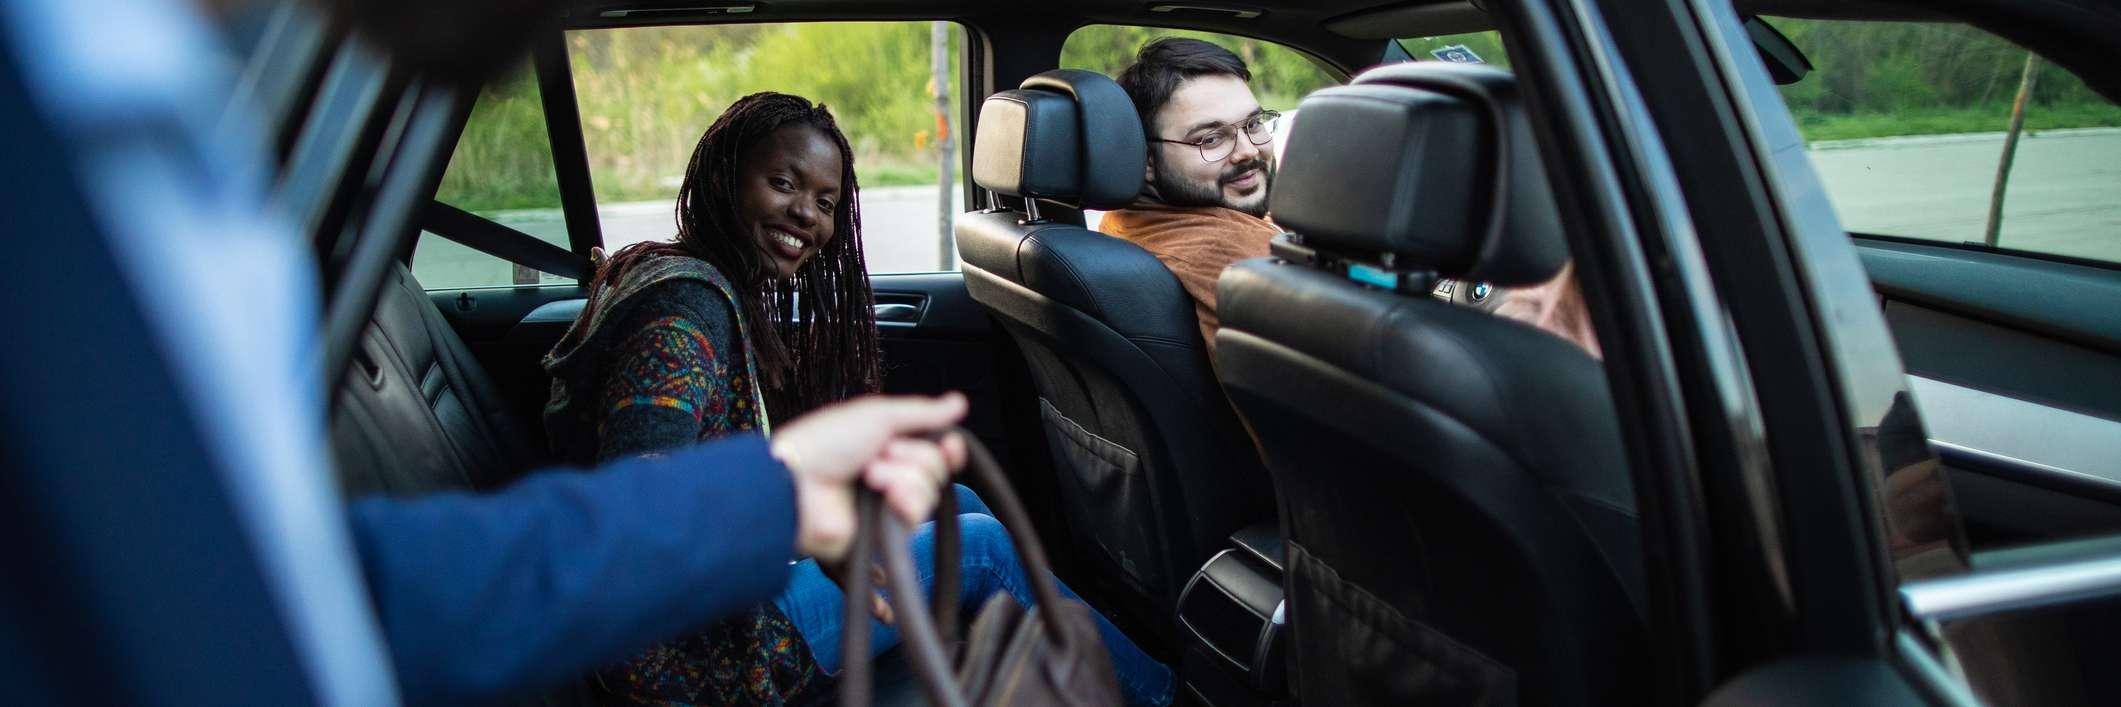 Carpooling friends